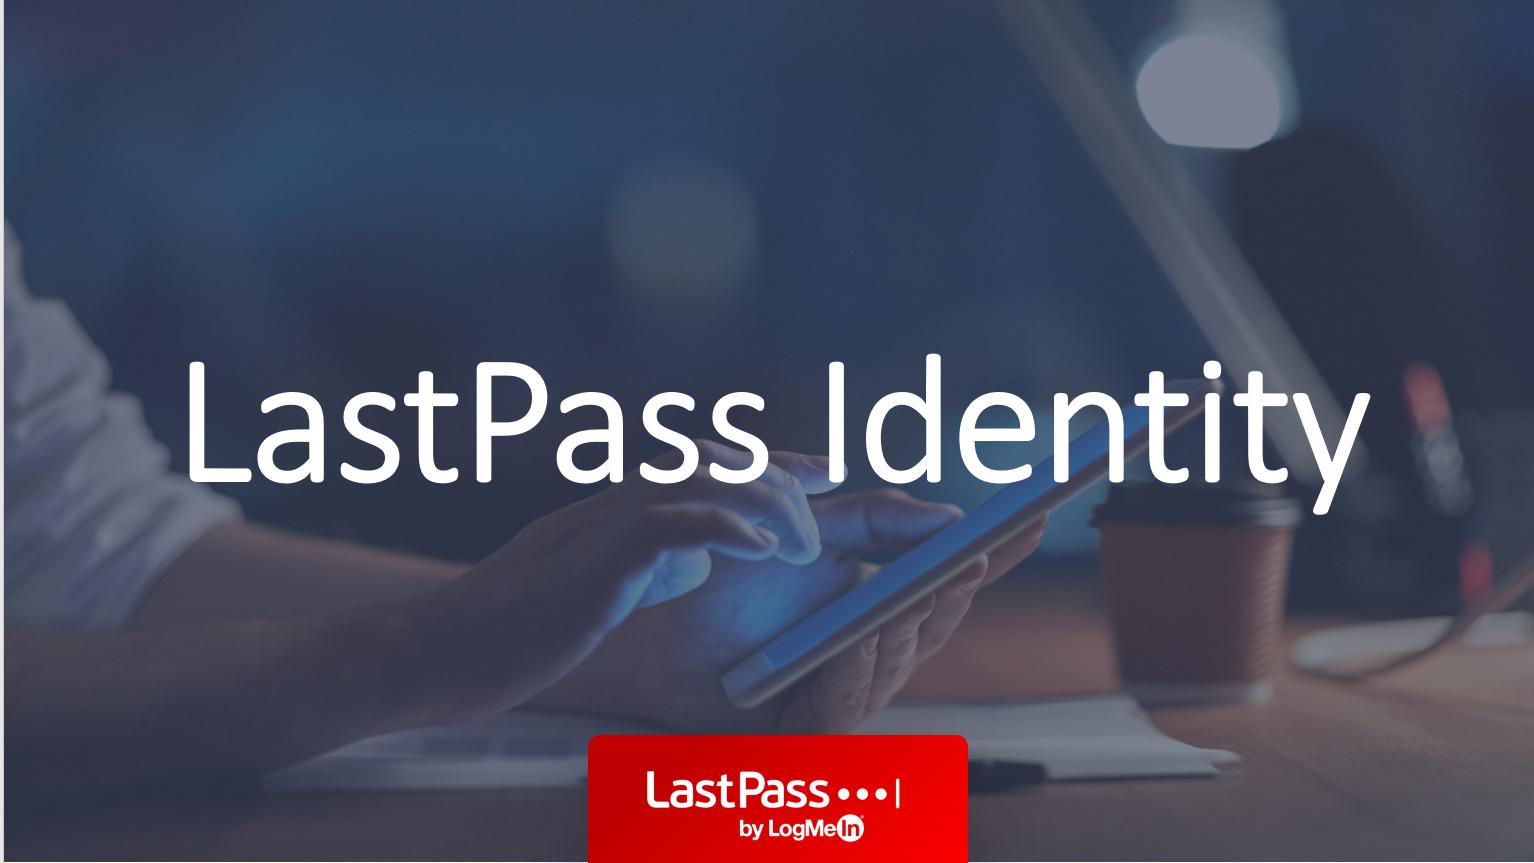 LastPass Identity